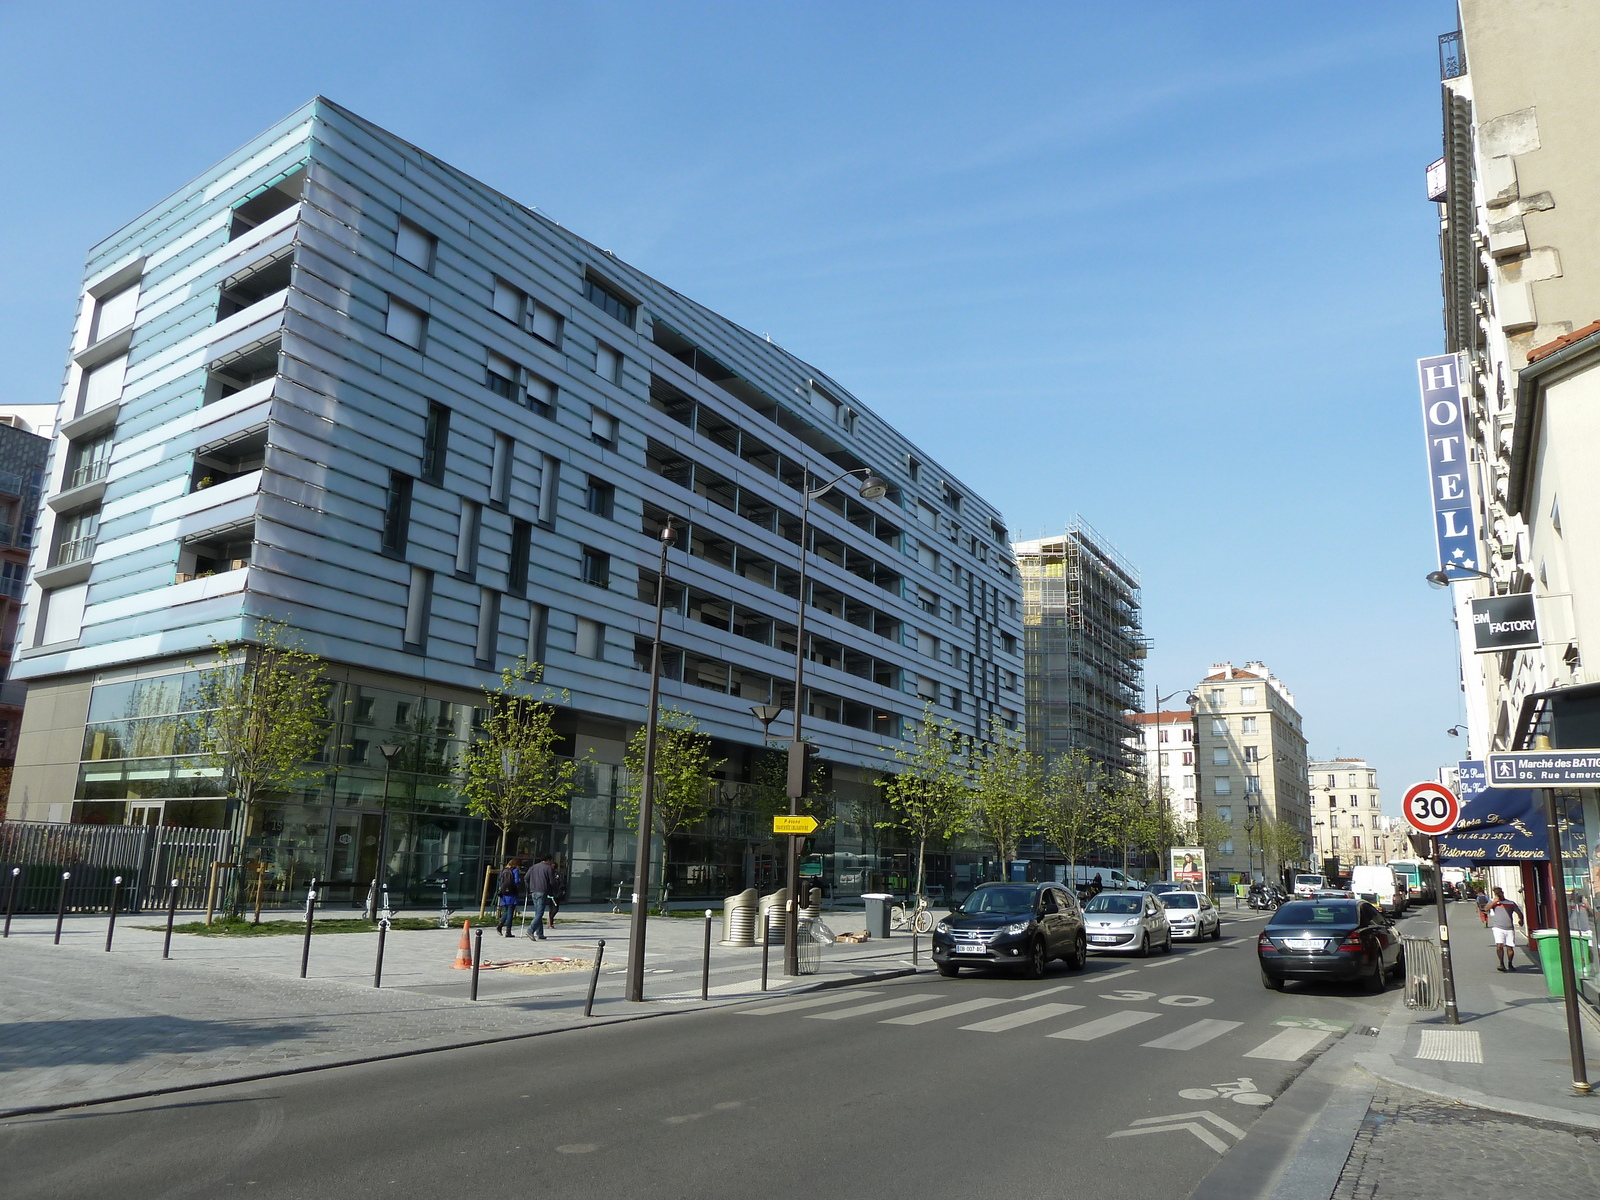 File:Rue Cardinet, Paris mars 2014.jpg - Wikimedia Commons